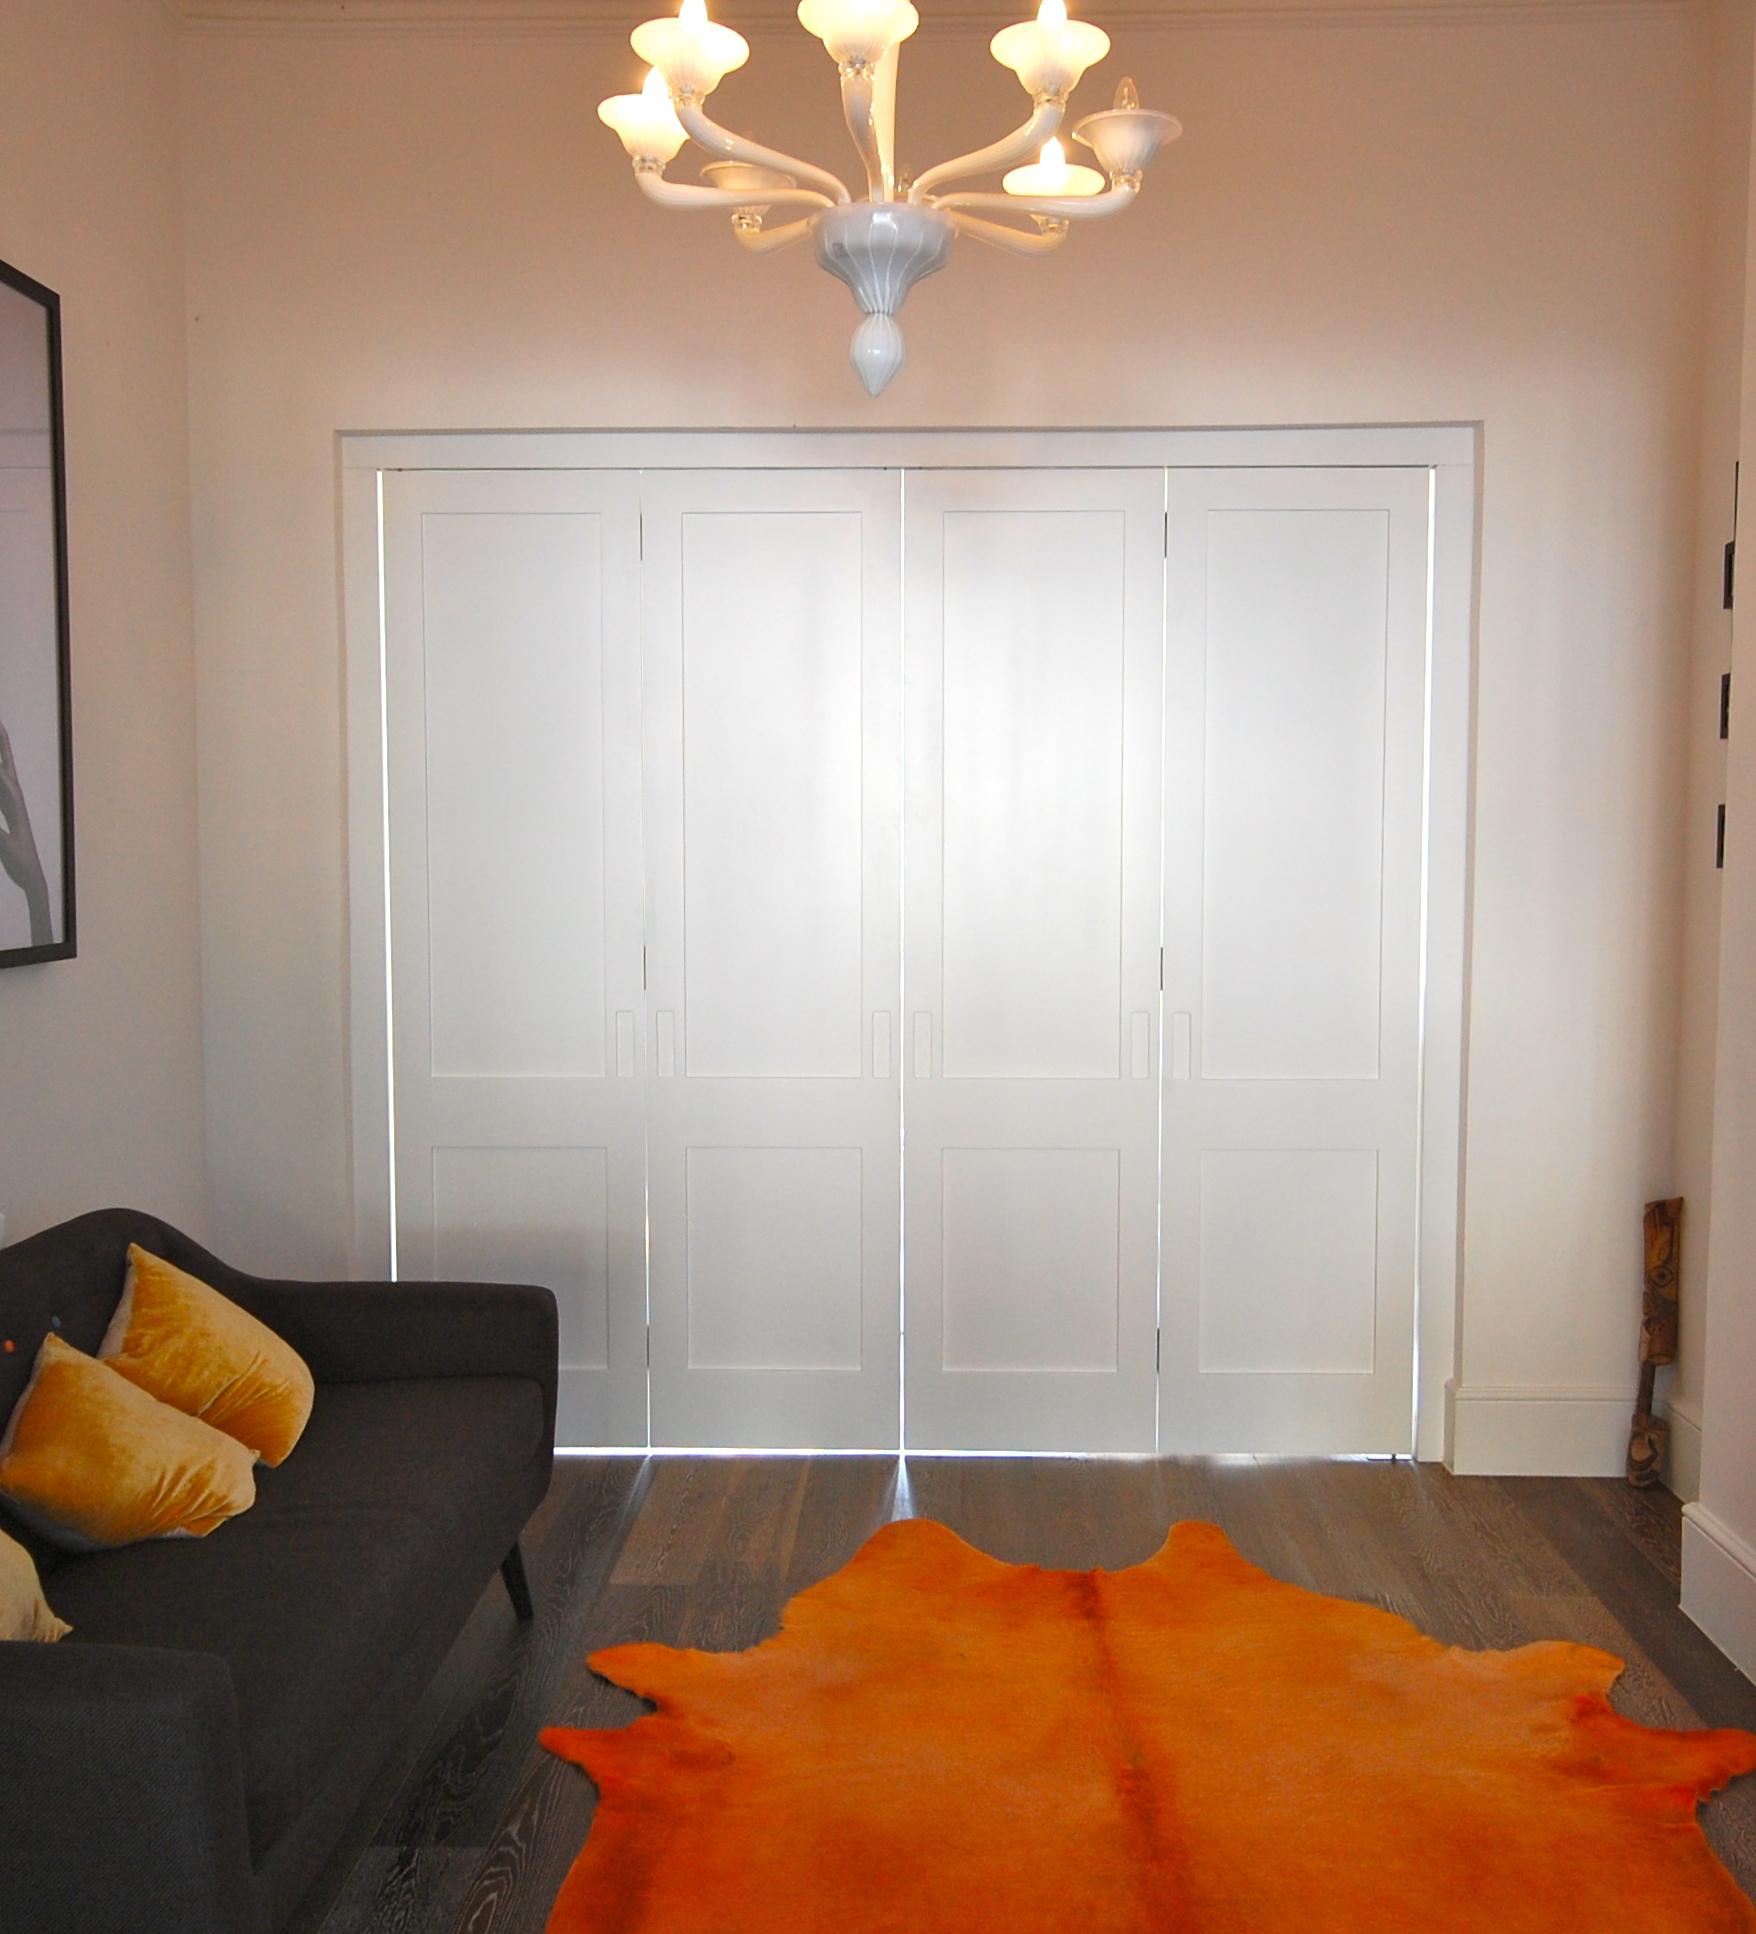 Grain_Bespoke_Furniture_White_Sprayed_Room_Divider_Sideboard_2.jpg